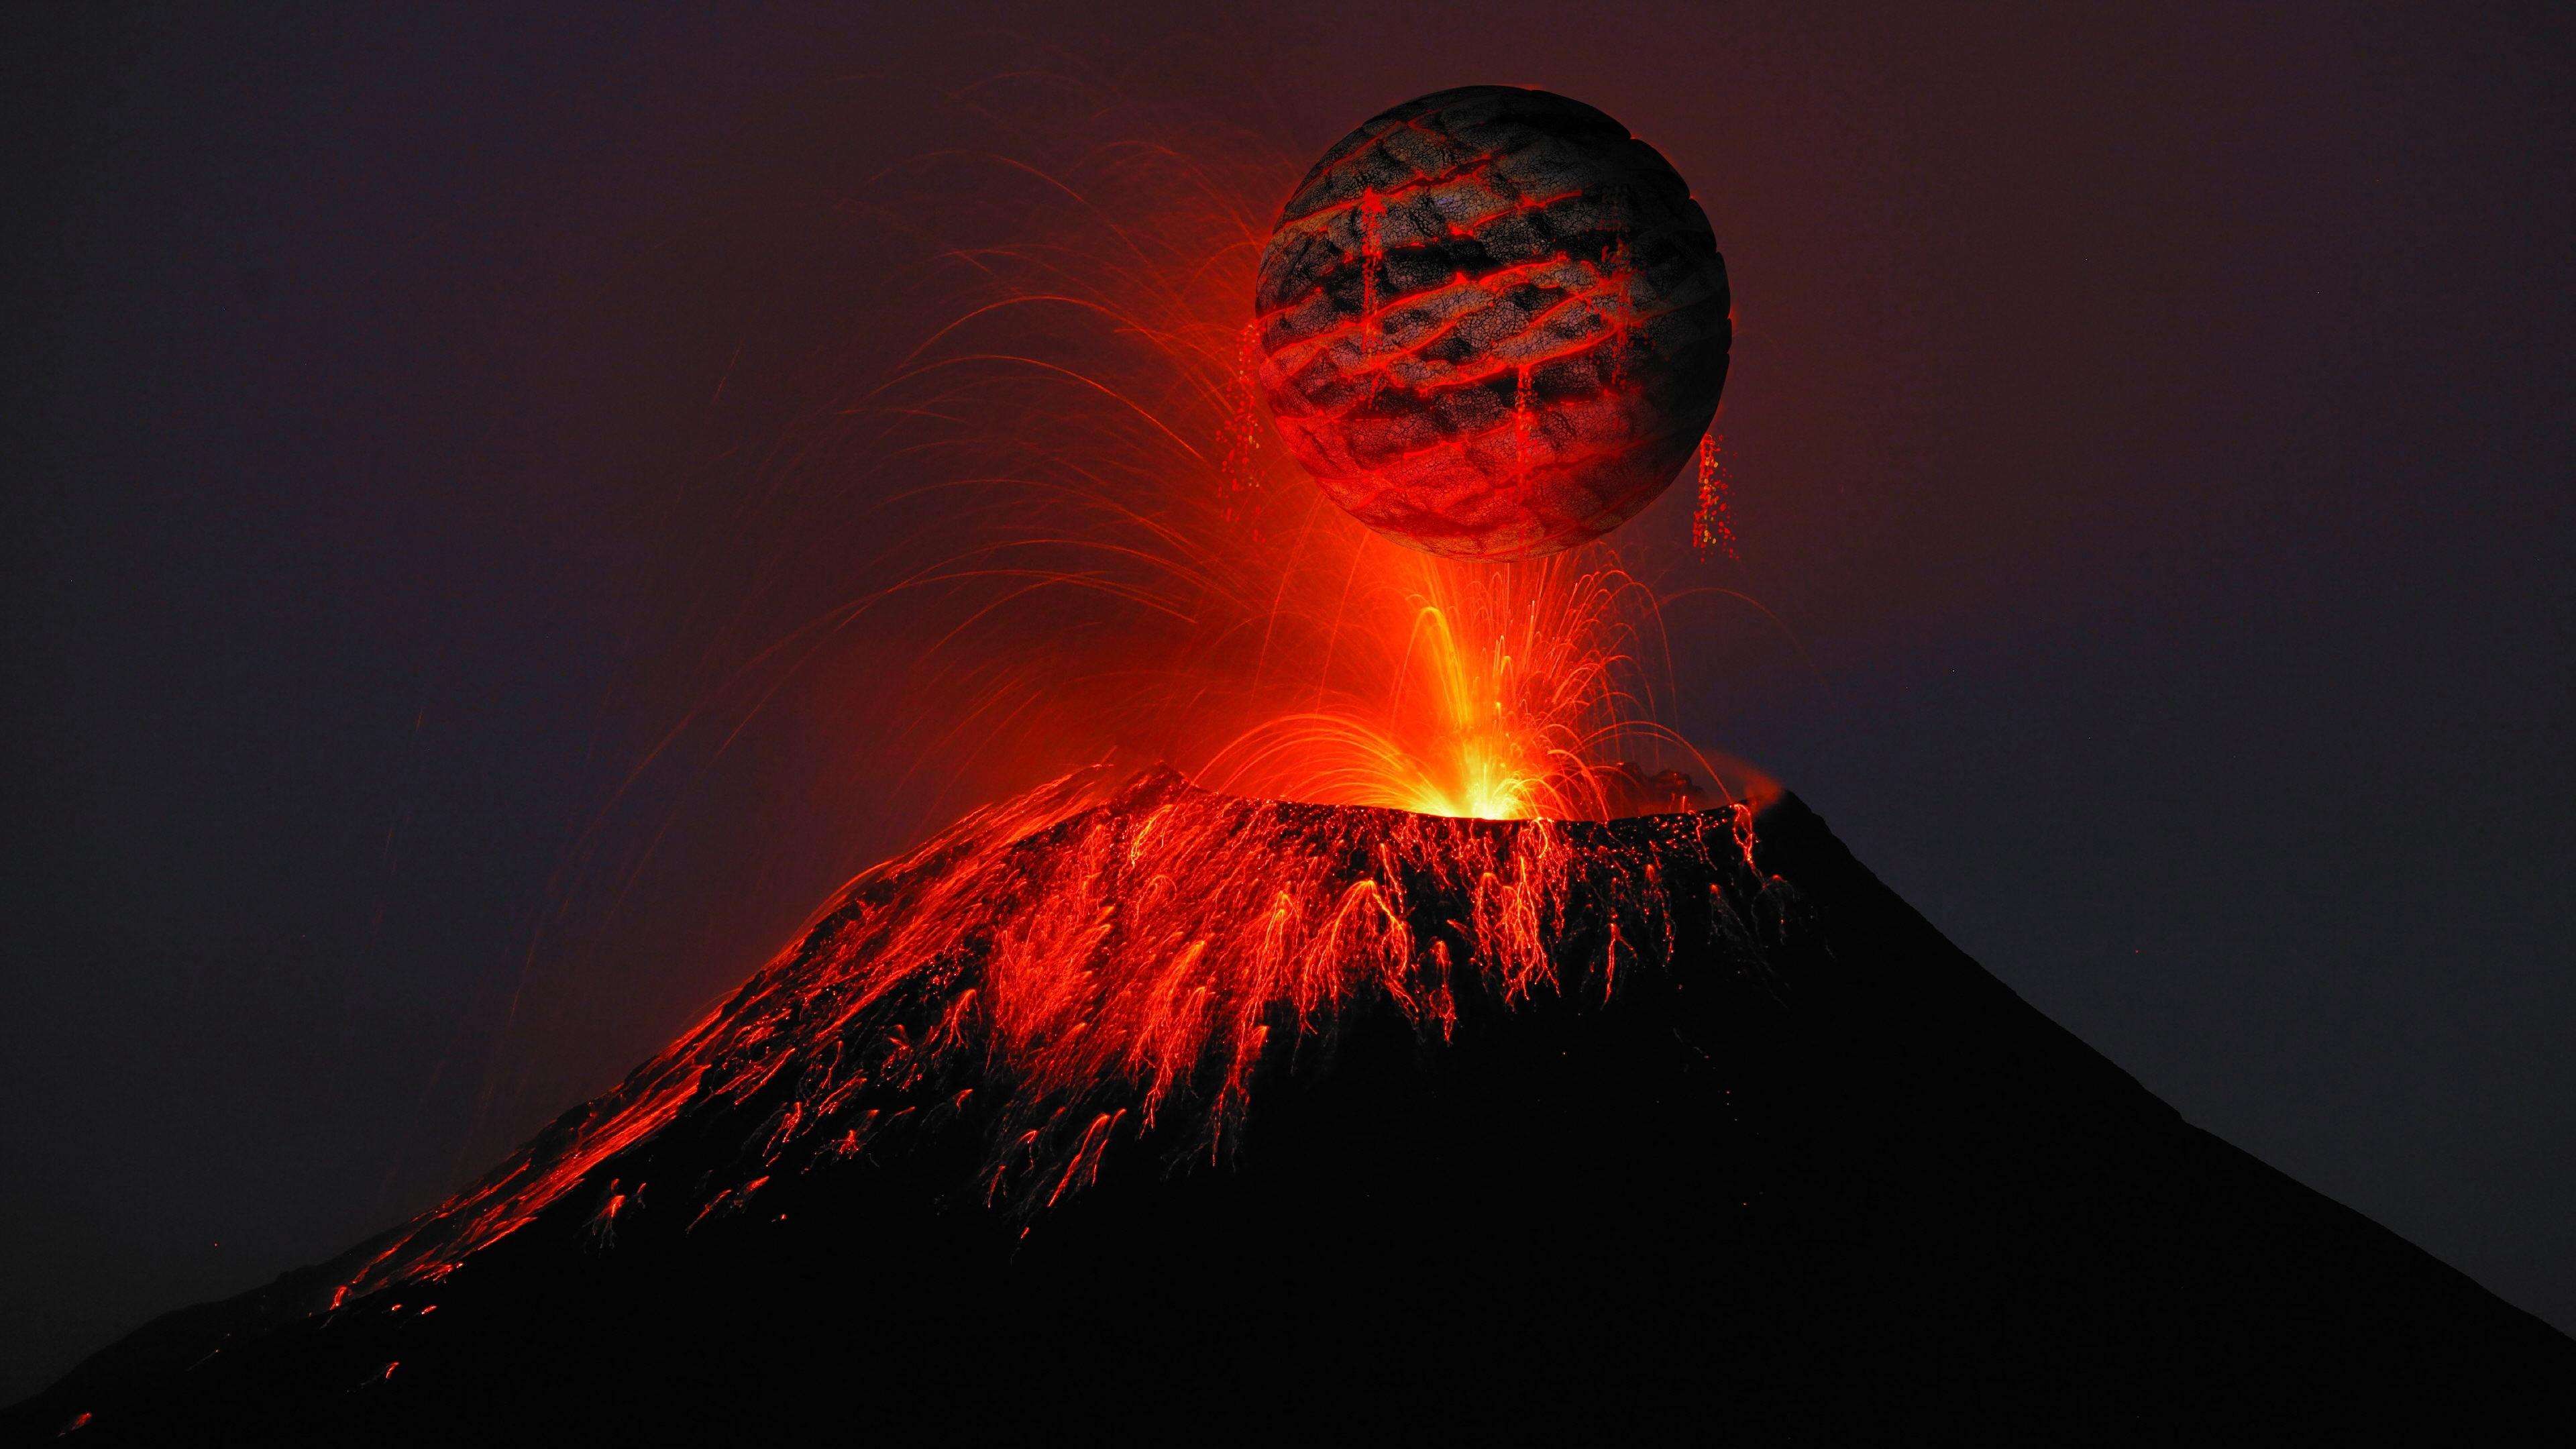 volcano lava sparks cracks balloon 4k 1541116060 - volcano, lava, sparks, cracks, balloon 4k - volcano, Sparks, Lava